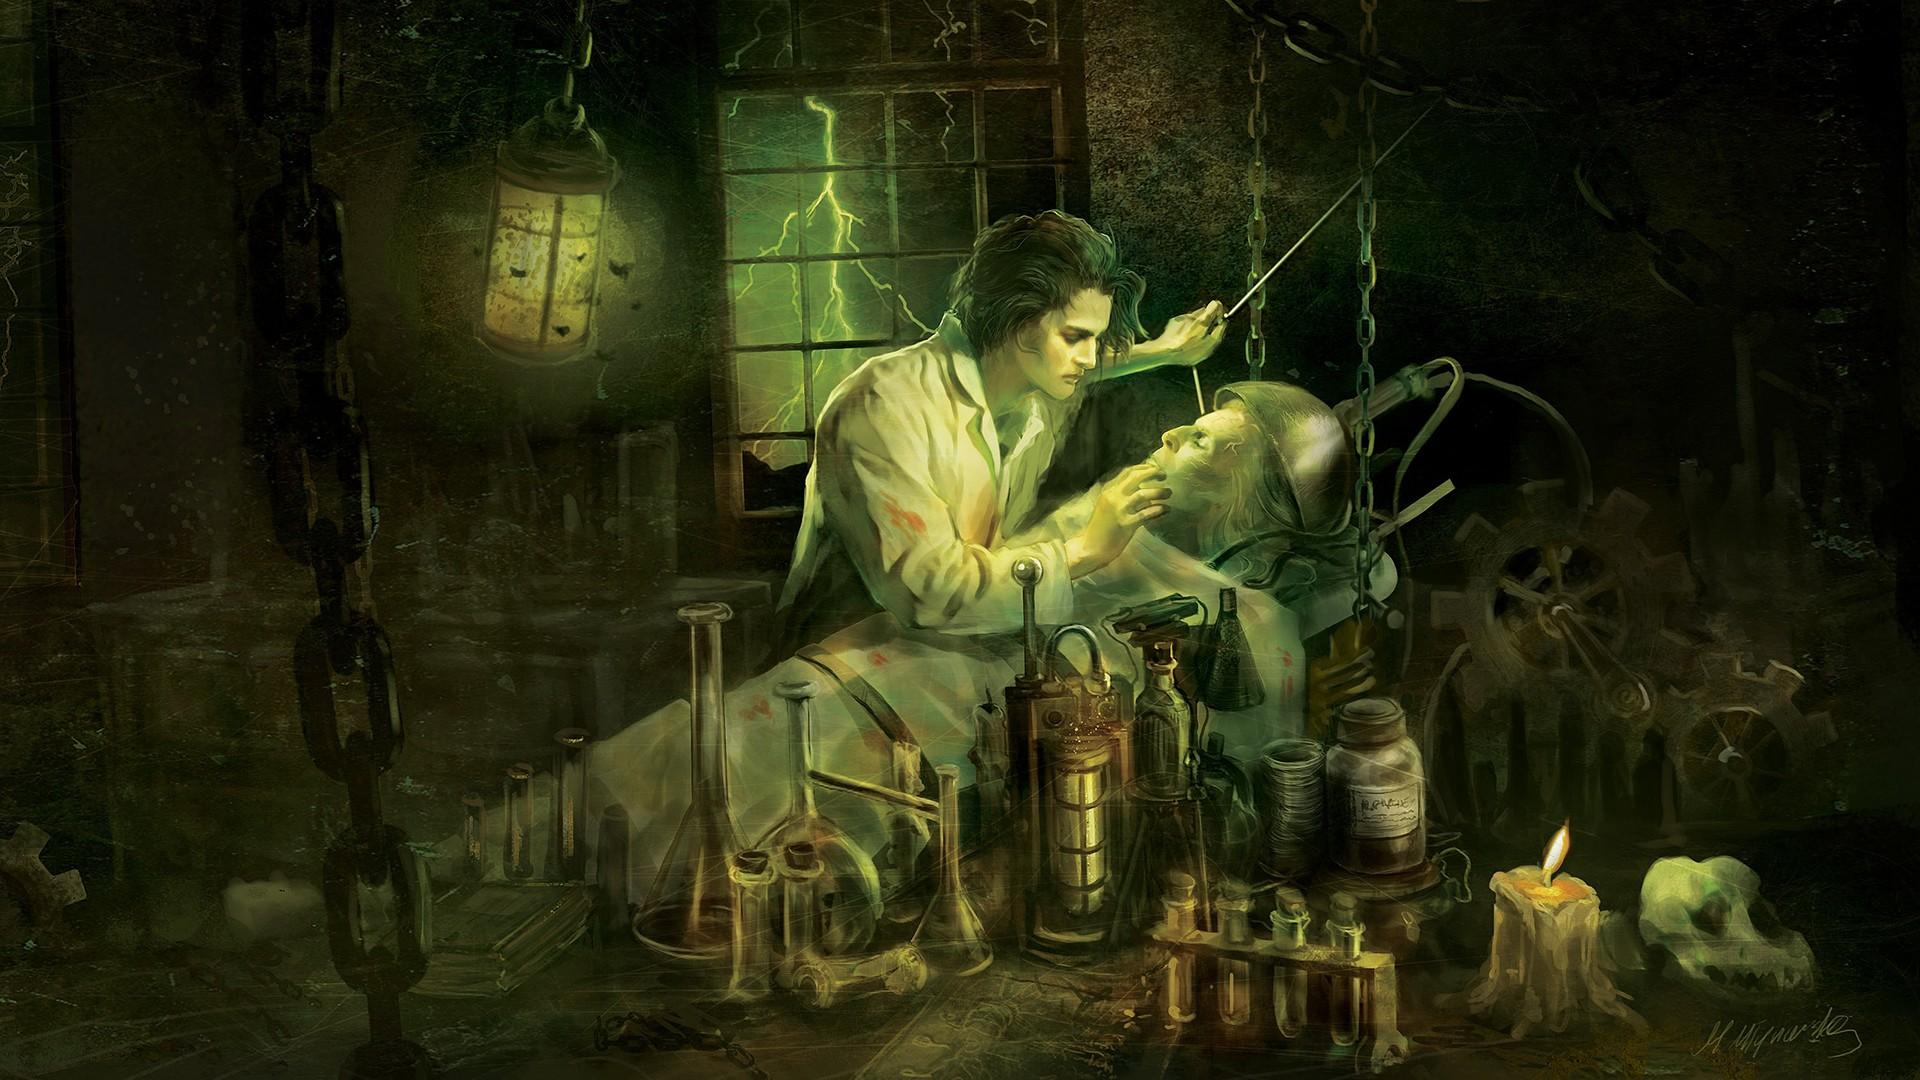 Jogando luzes nas trevas (Parte 2) A Ciência Gótica chega ao Brasil